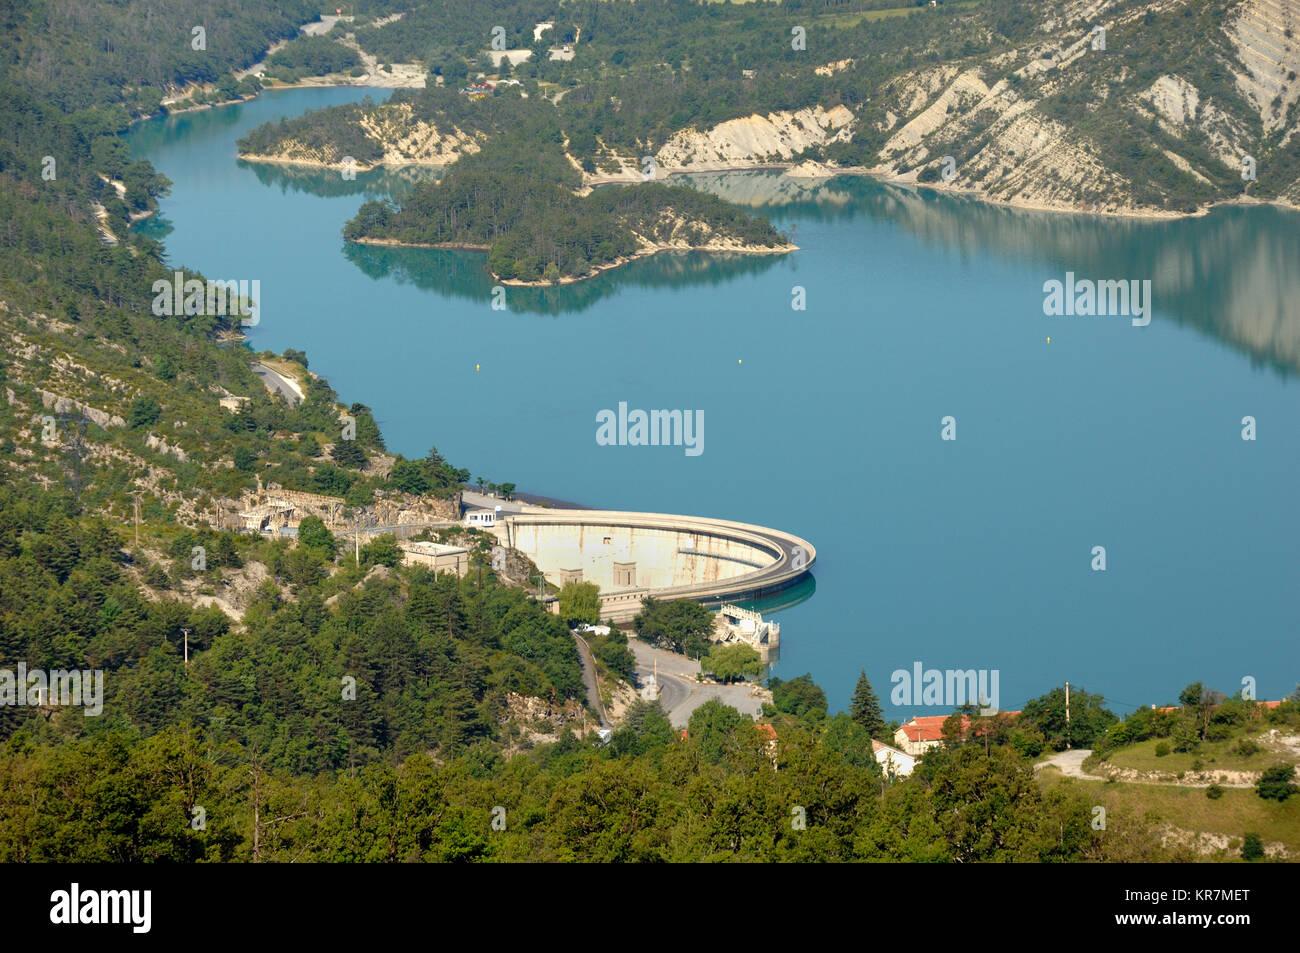 Aerial View over Castillon Lake, Reservoir and Hyroelectric Dam near Castellane, in the Verdon Valley, Alpes-de Stock Photo